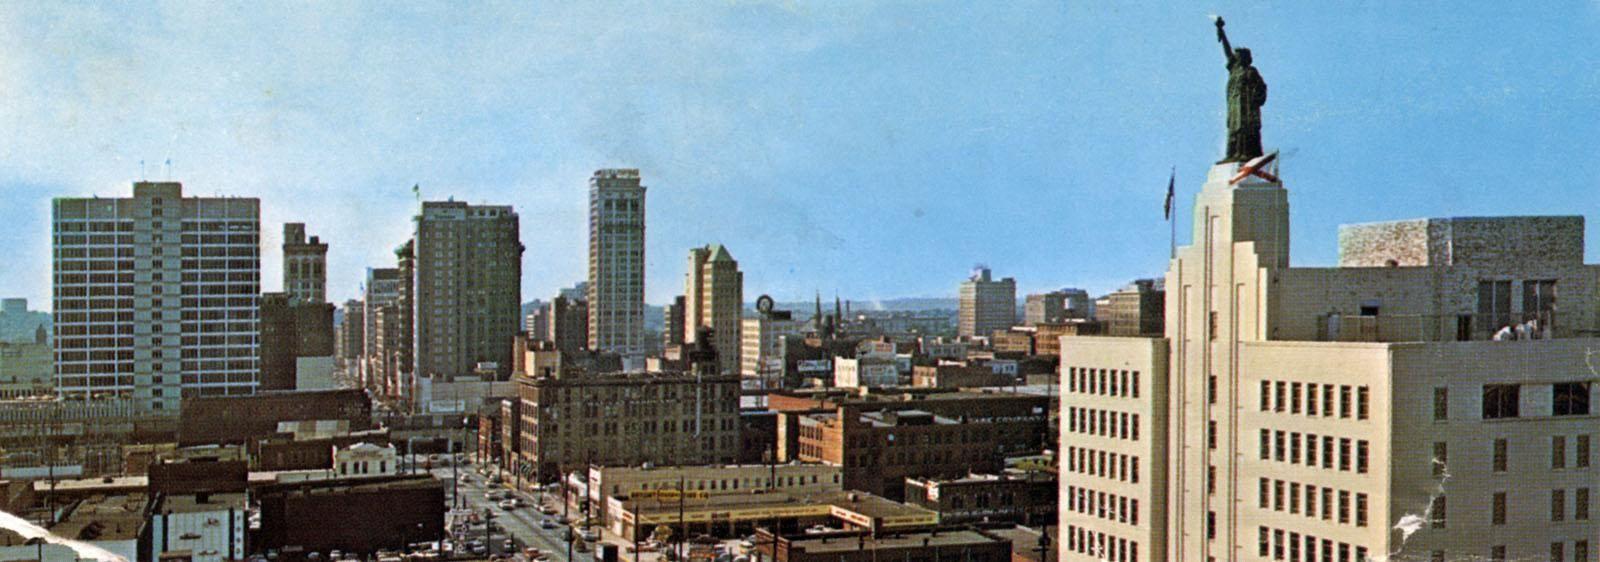 Birmingham Skyline From Parliament Hotel 1960s Birmingham